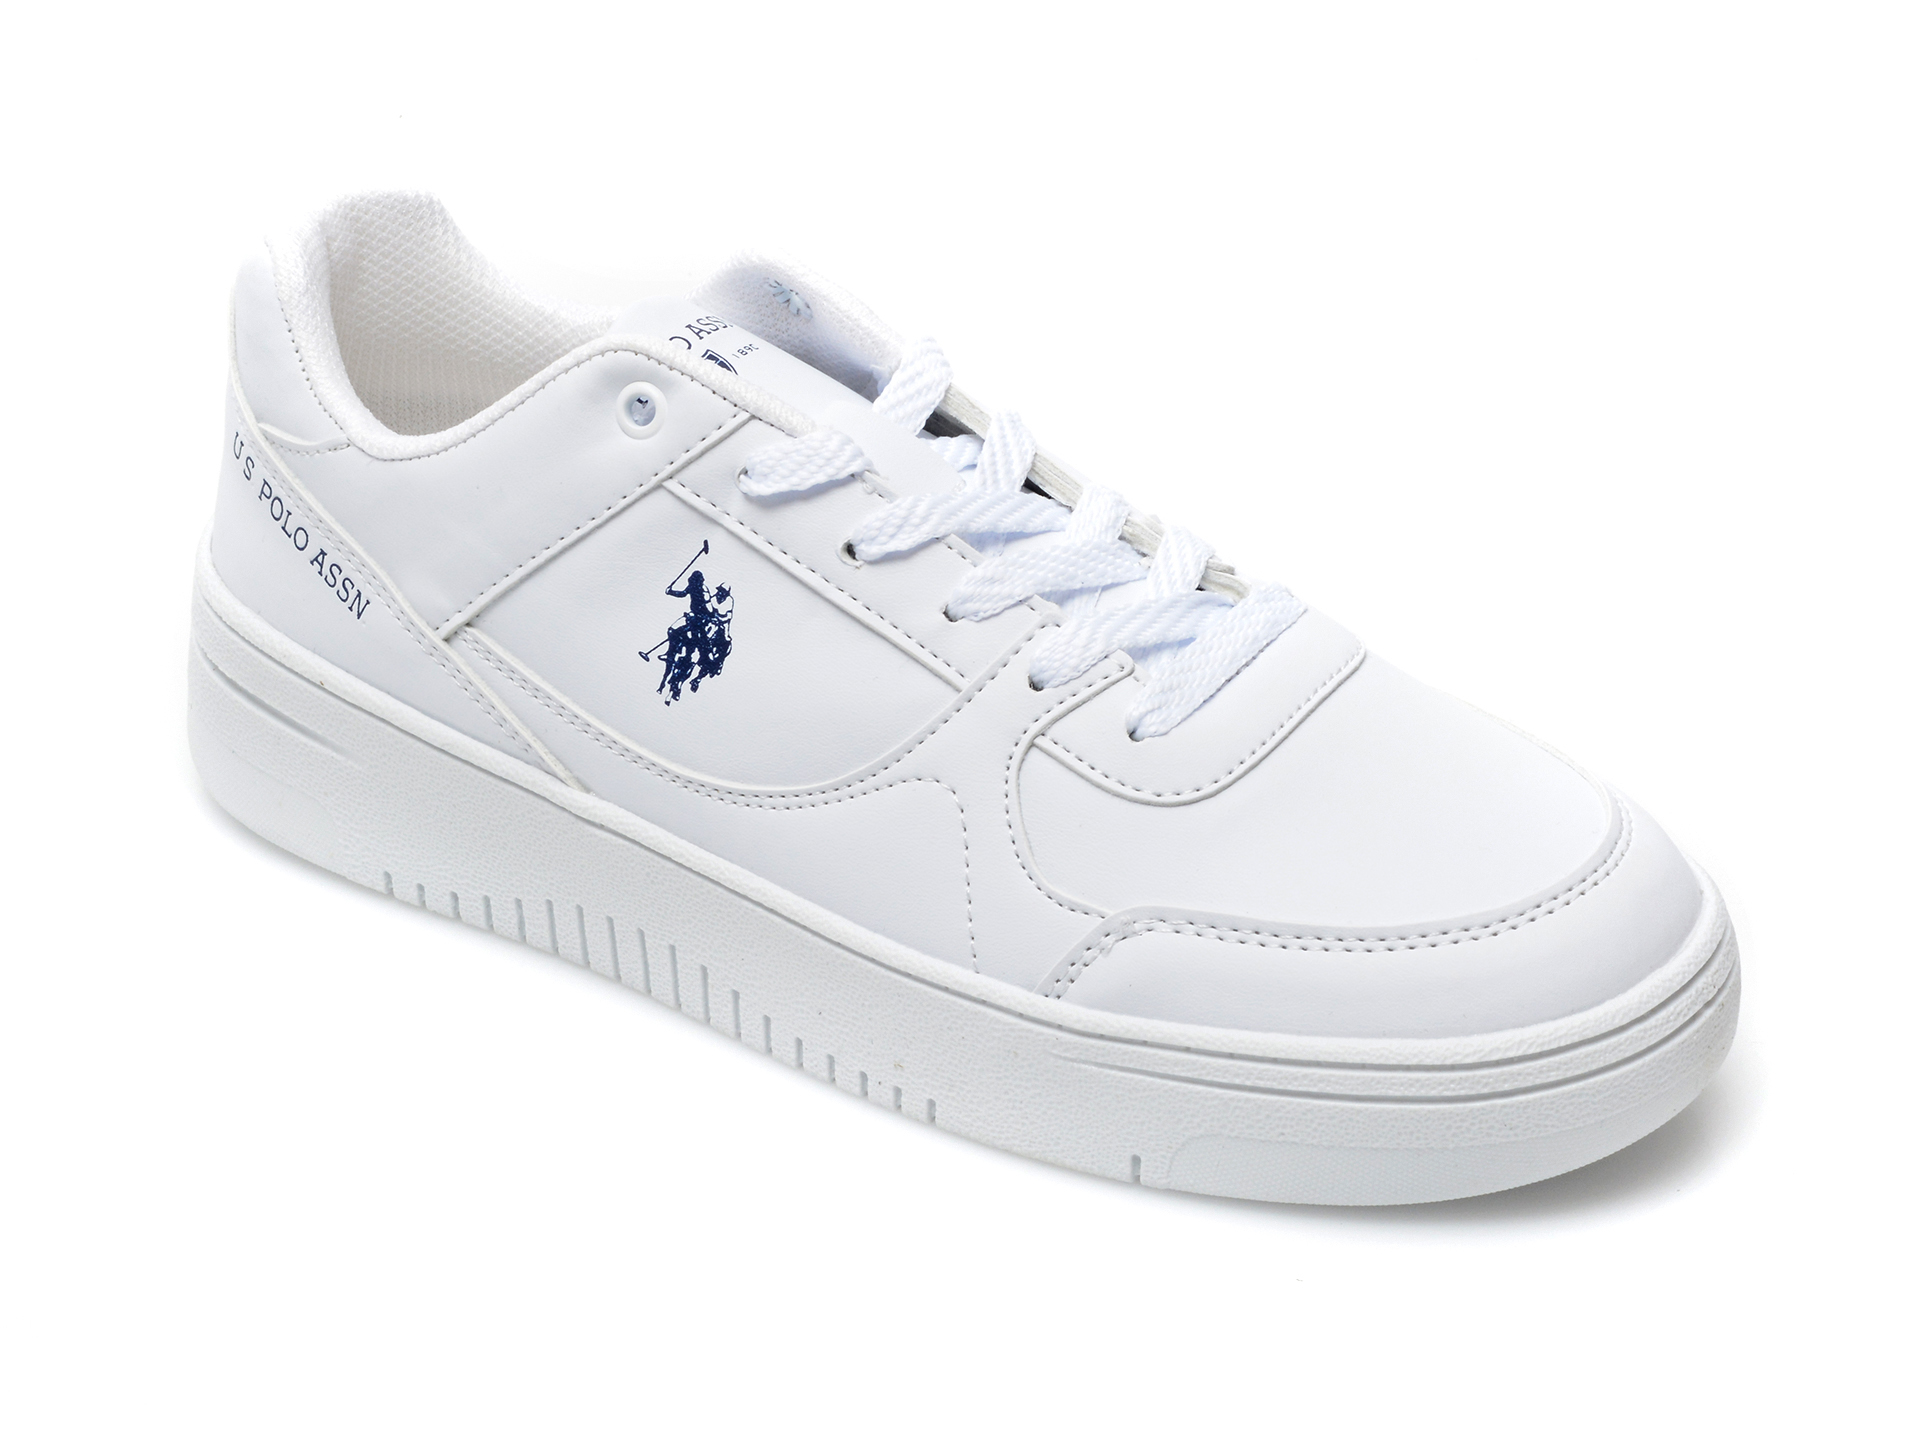 Pantofi sport US POLO ASSN albi, LEEWMN, din piele ecologica imagine otter.ro 2021